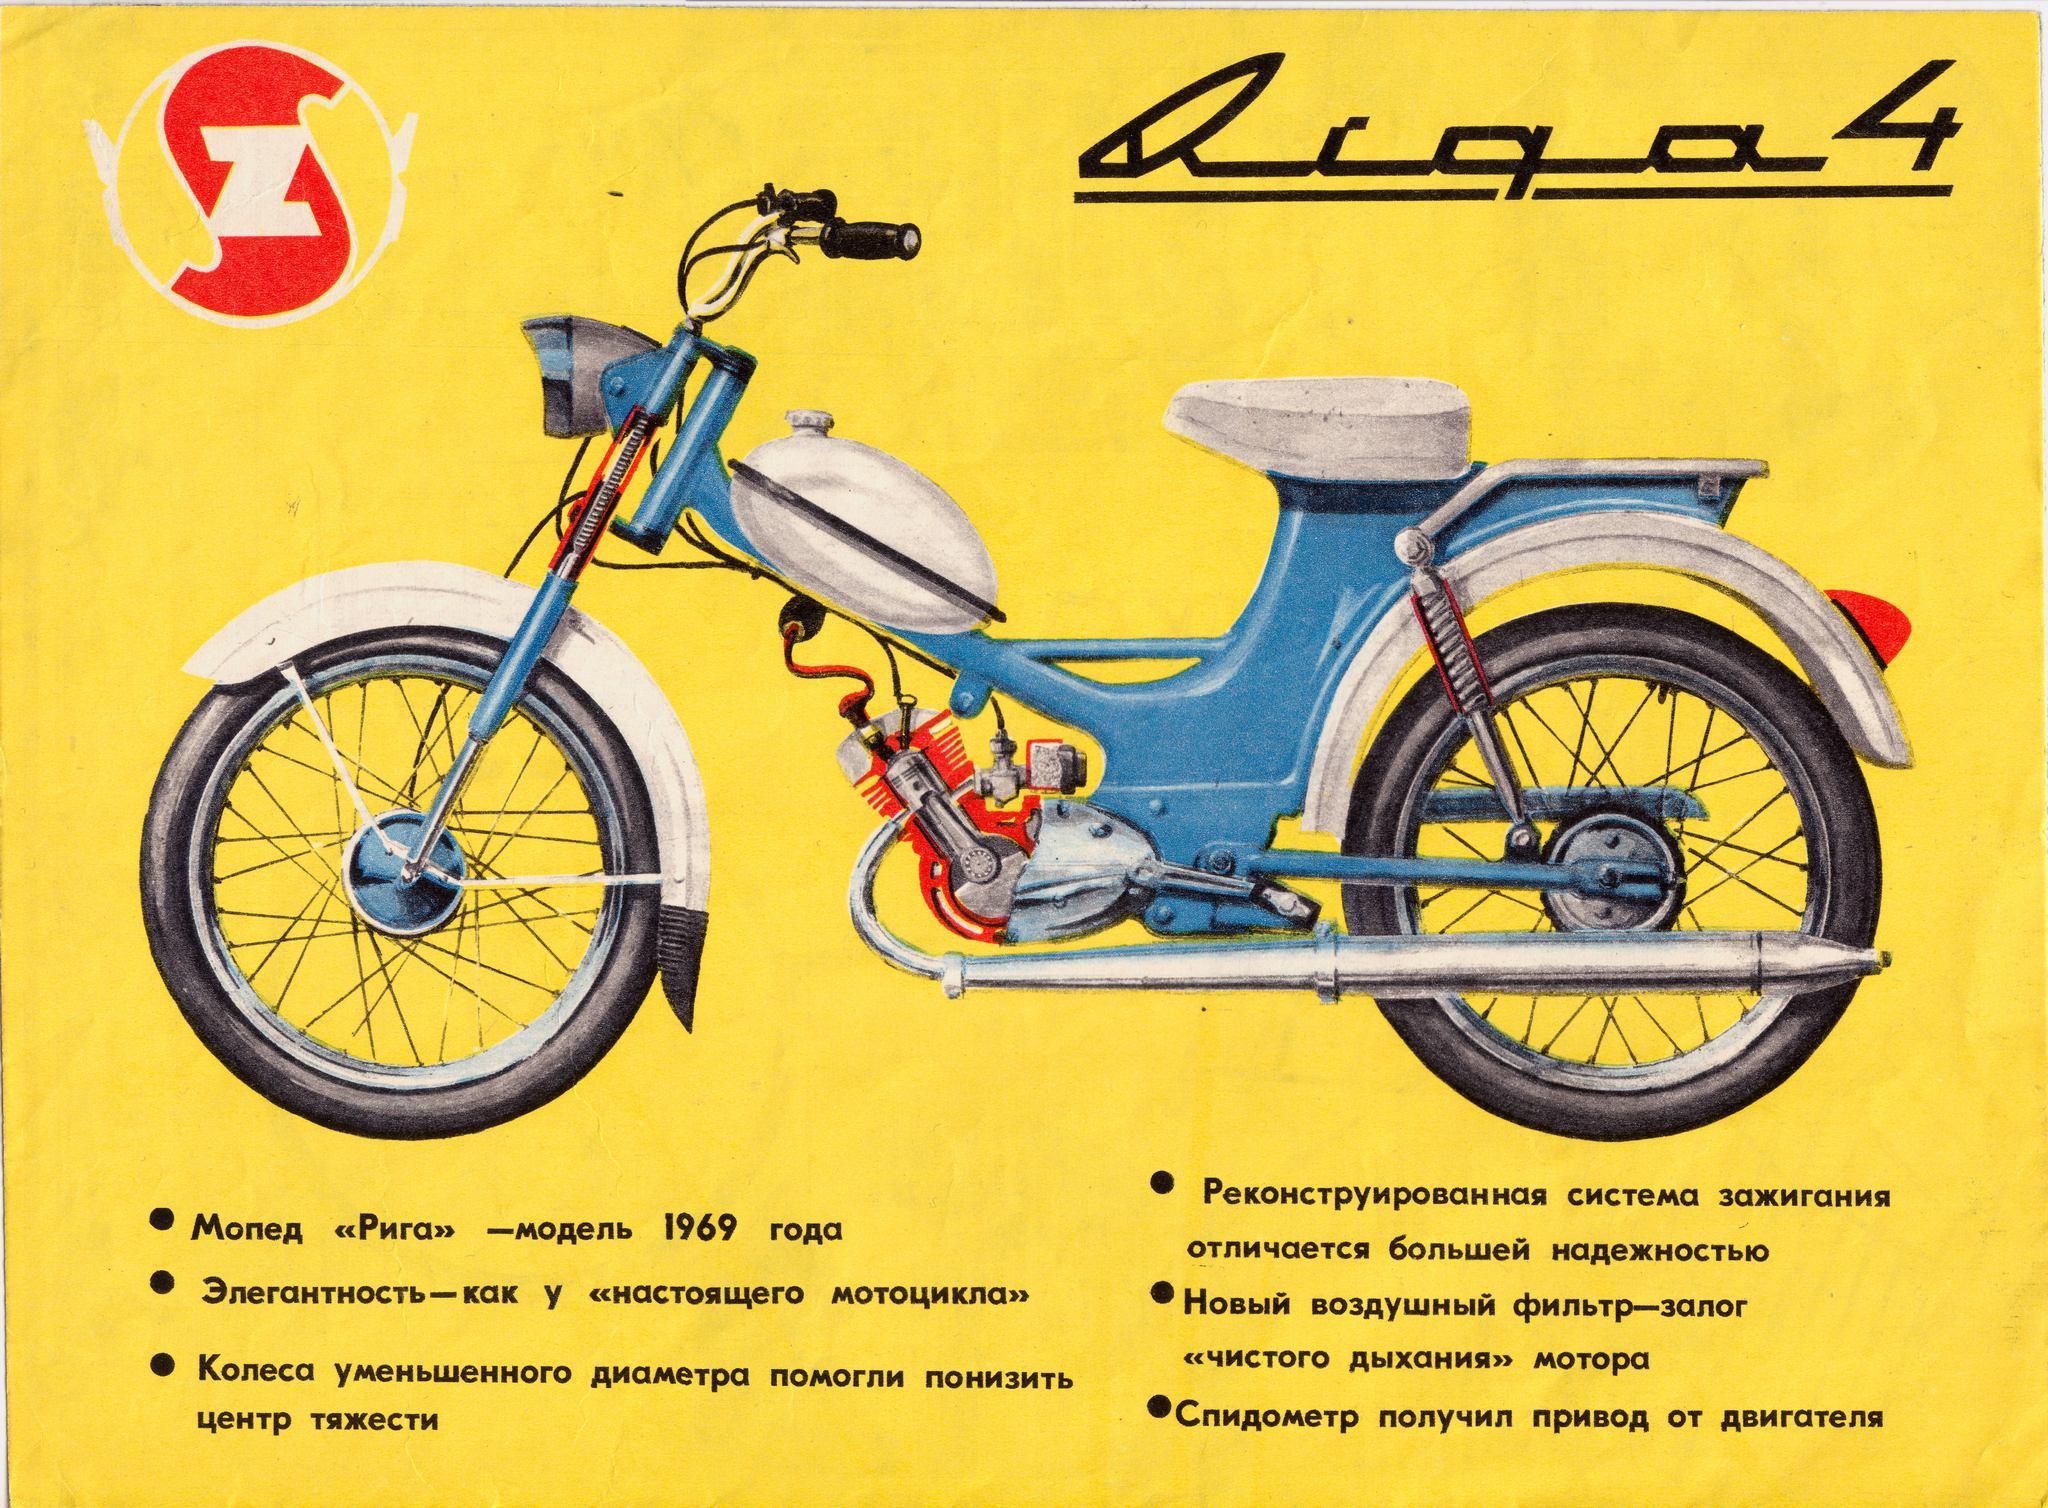 Инструкция по эксплуатации мопеда рига-13